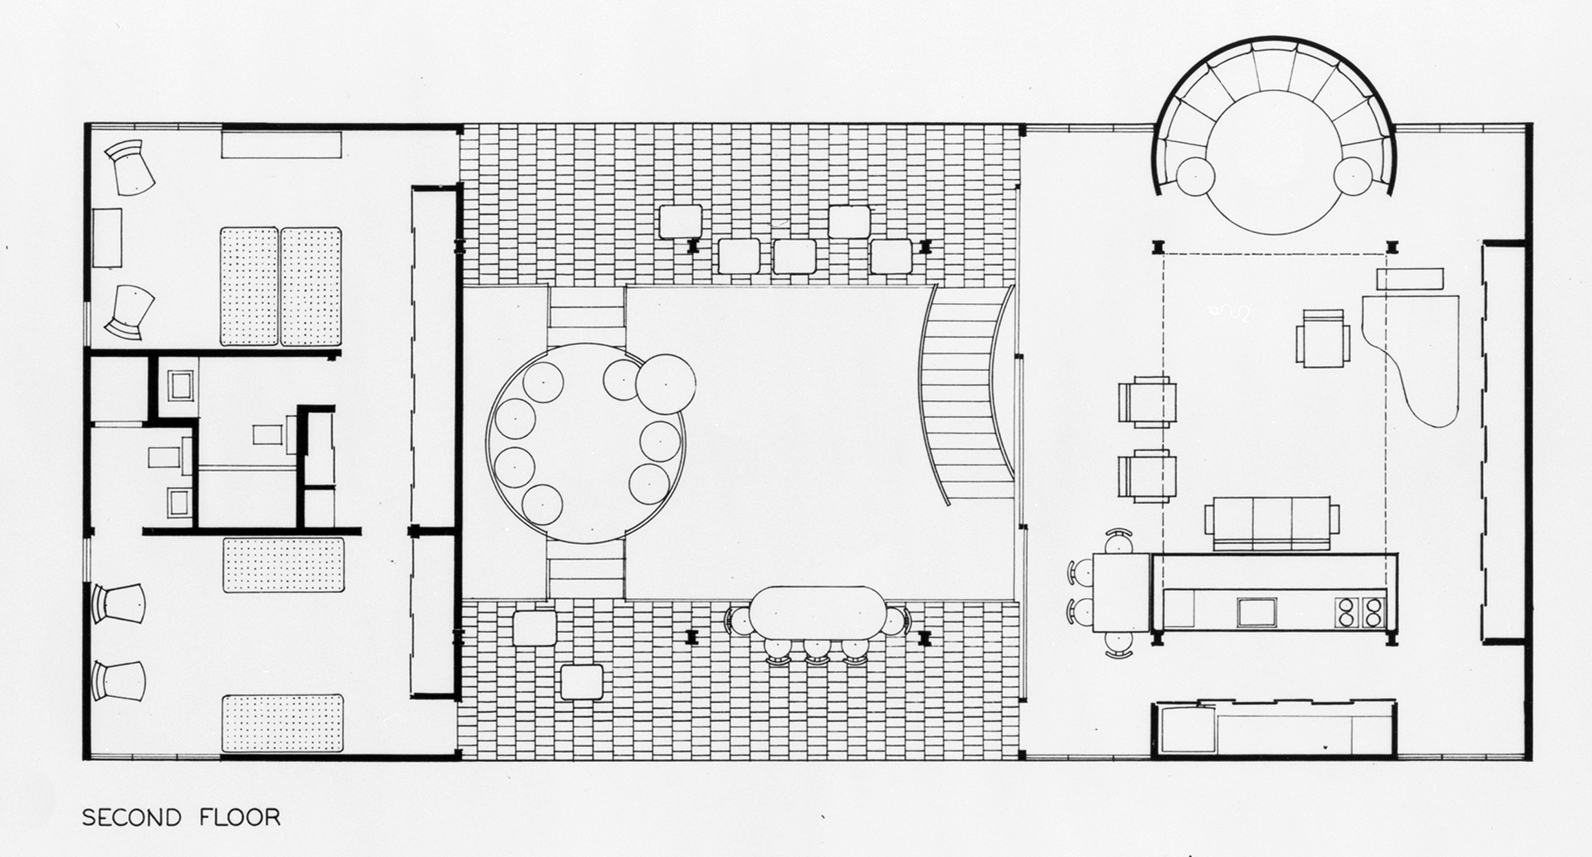 Cohen residence, Siesta Key, Florida. First Scheme. First Floor Plan.